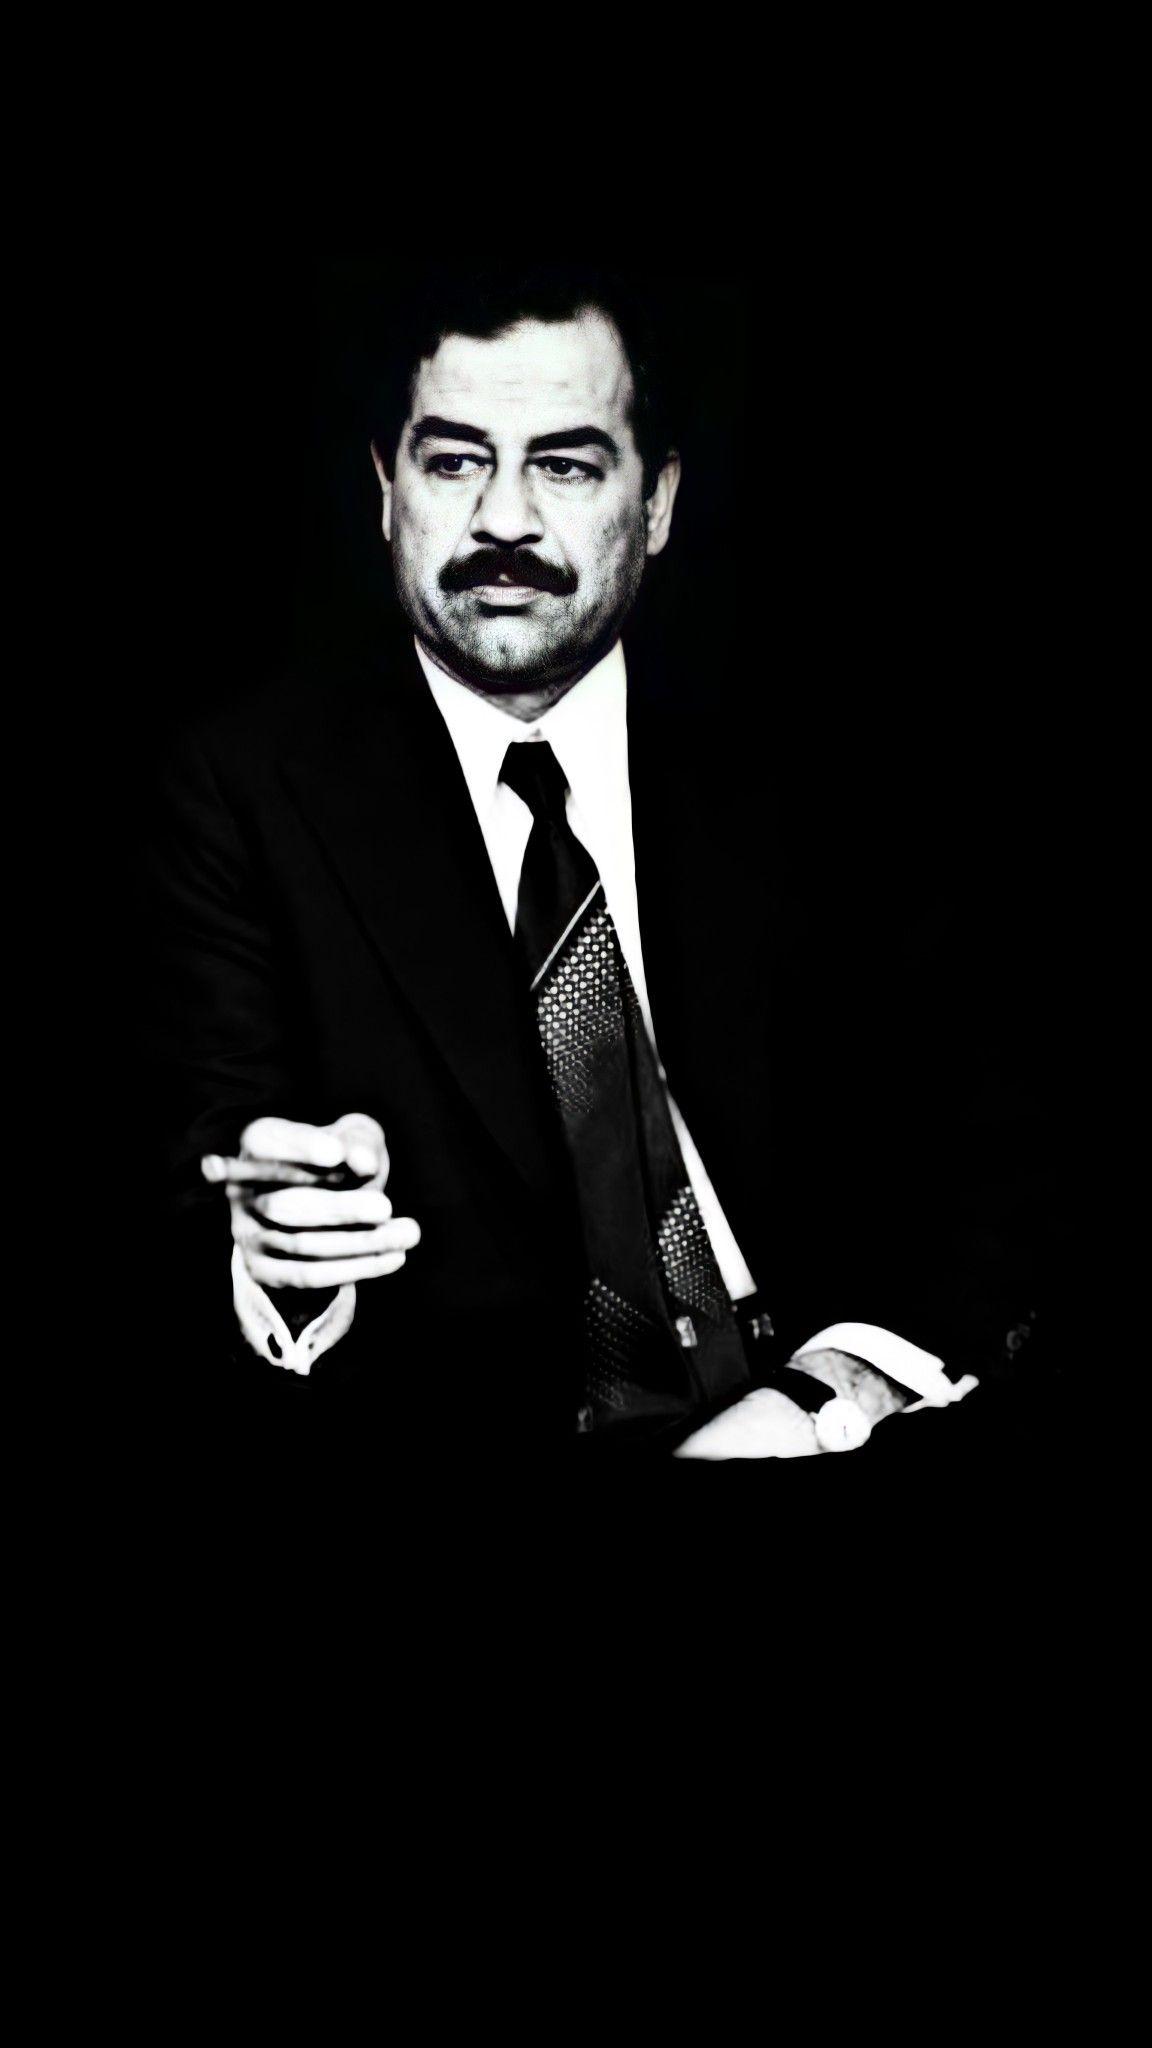 صدام حسين صورة خلفية Saddam Hussein Creative Instagram Photo Ideas Iraqi President Baghdad